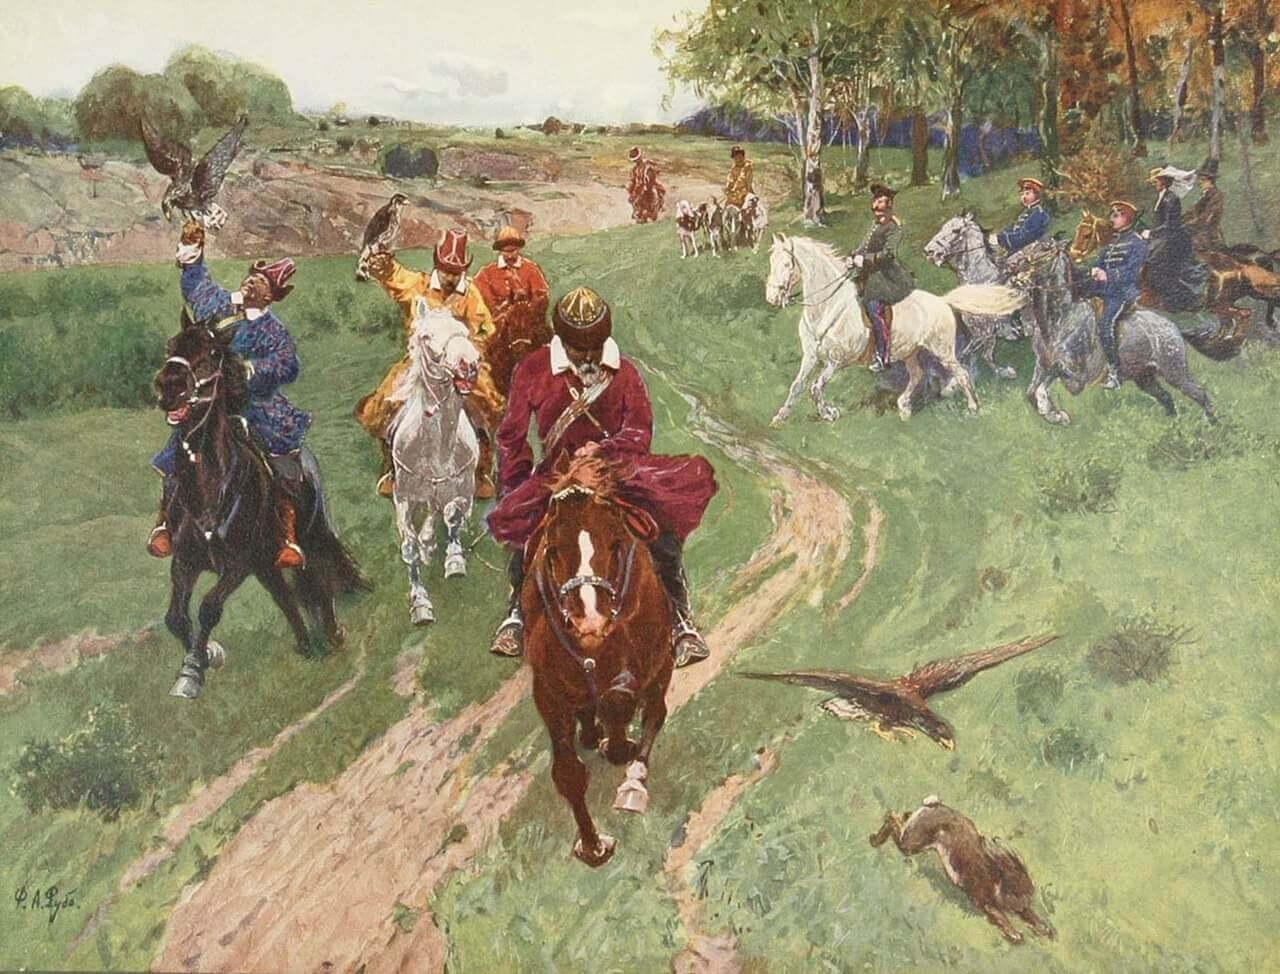 Картина Франца Рубо «Охота башкир с соколами в присутствии императора Александра II»